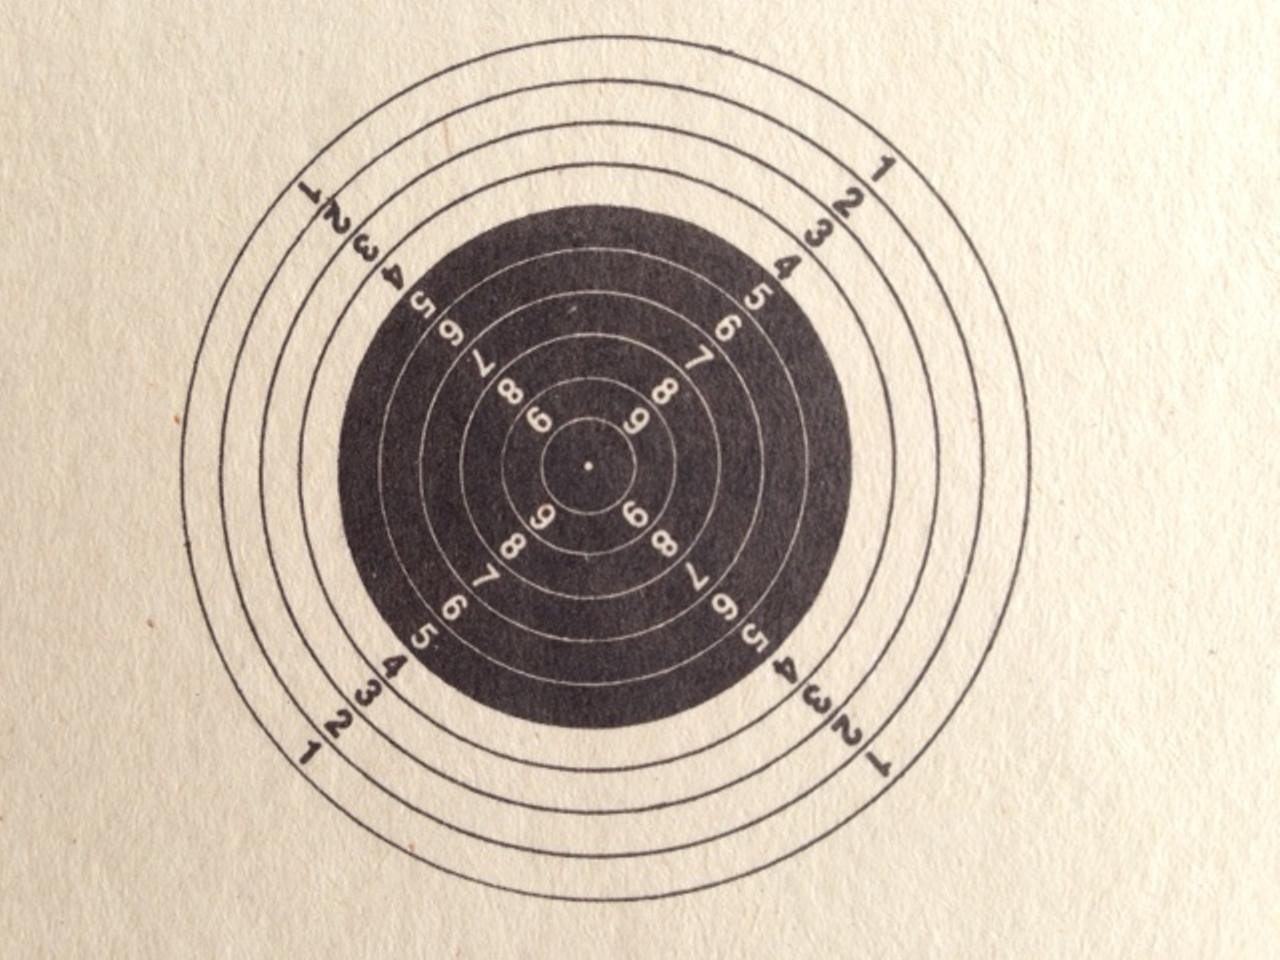 AR-6 Running Shooting Target